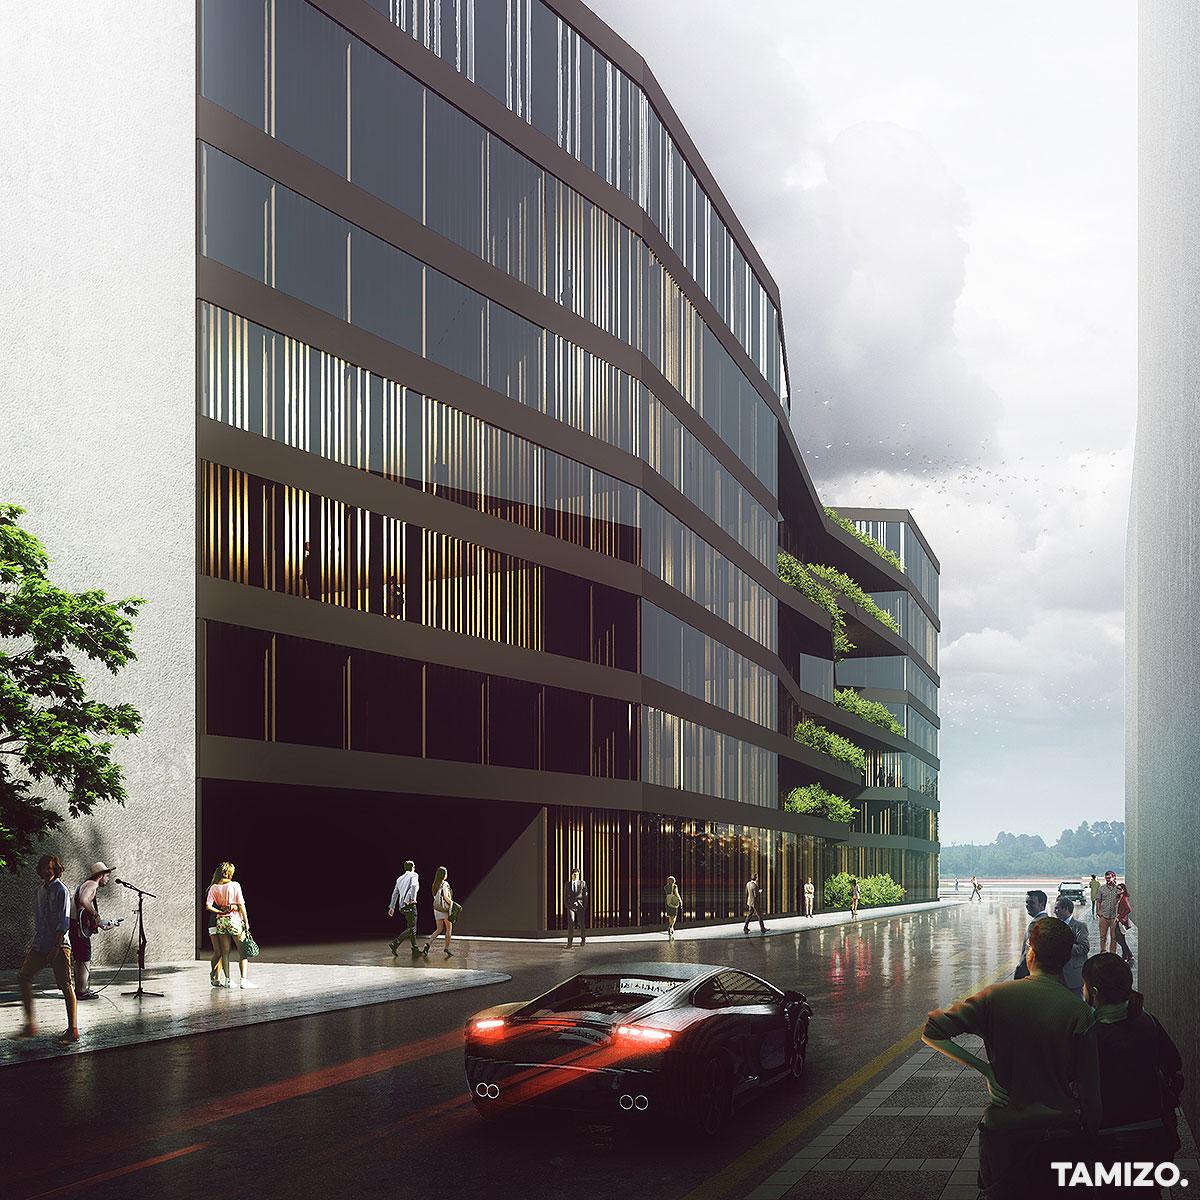 A066_archiutektura_biurowiec_office_building_tamizo_architects_kghm_wroclaw_04